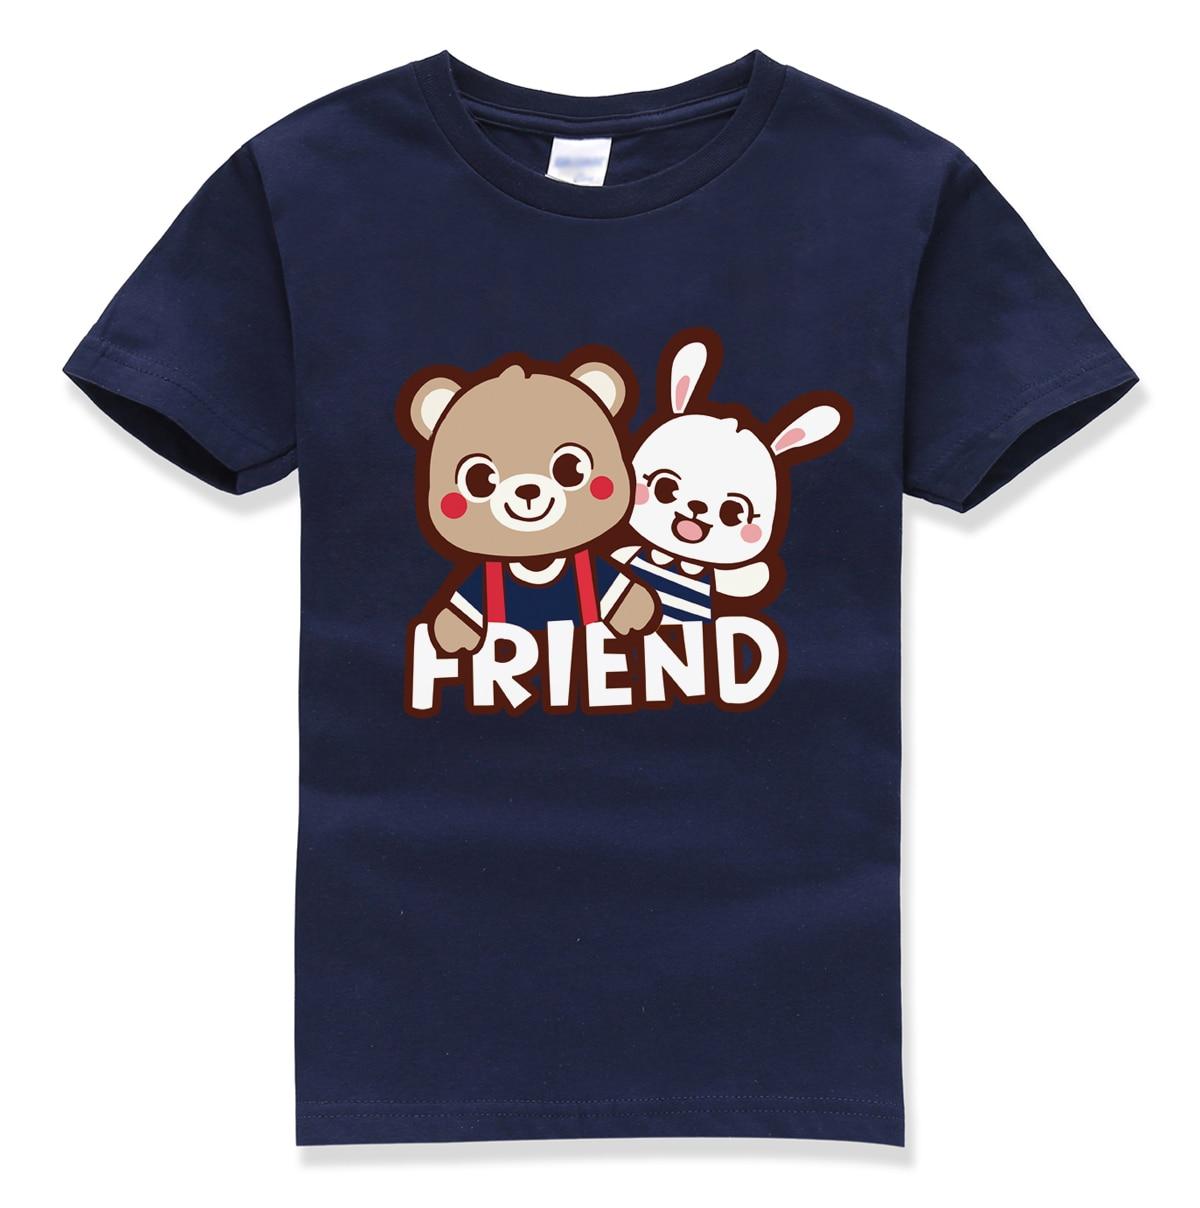 kawaii cartoon animal tops tee shirt kids casual o neck pullovers 2017 summer new fashion t